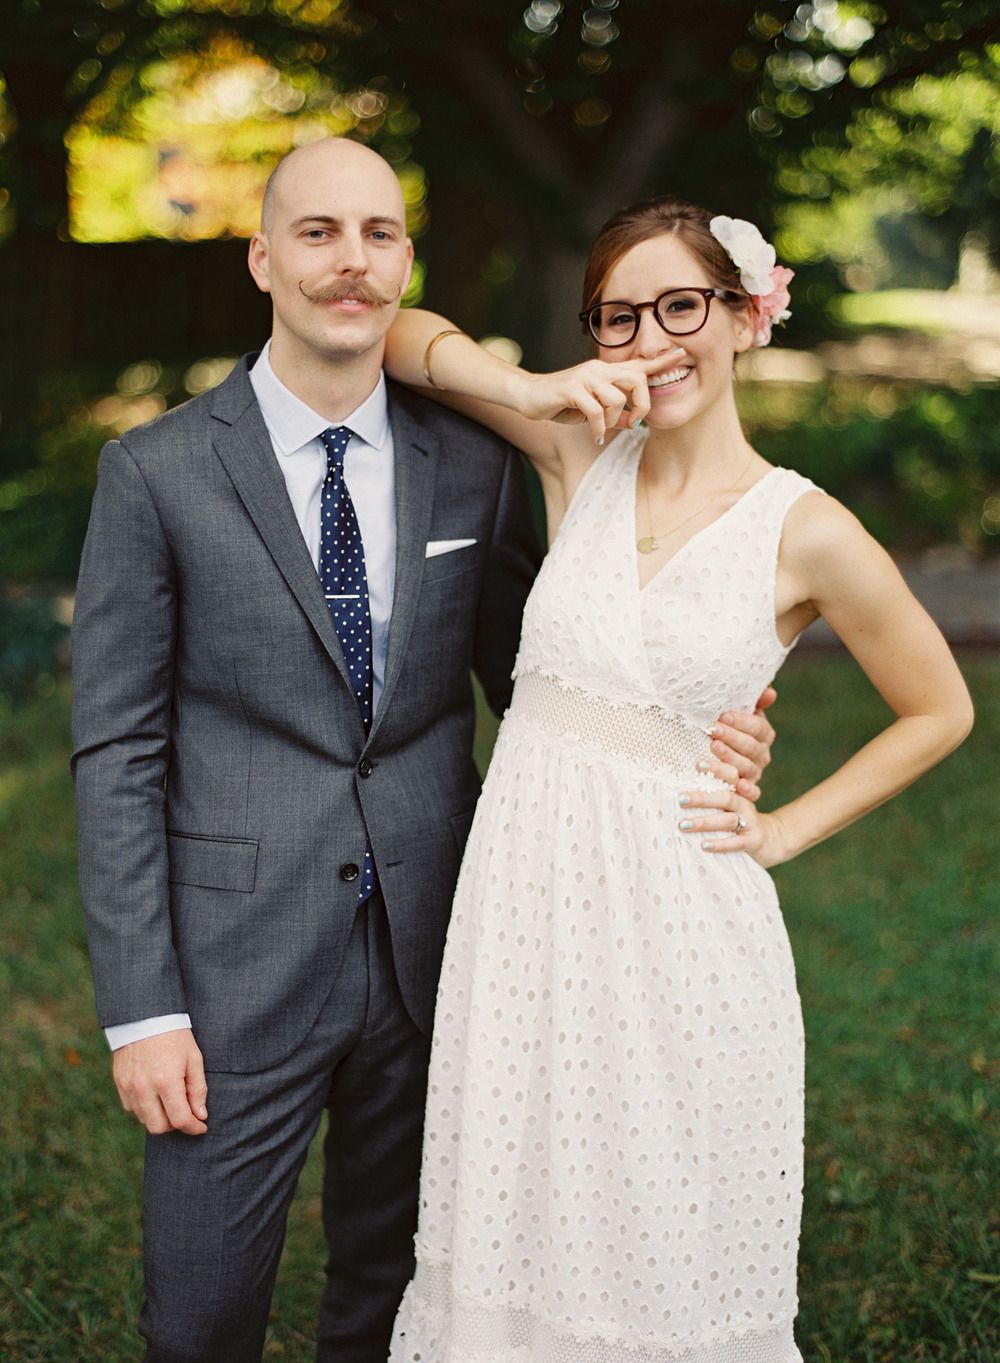 hipster-wedding.jpg